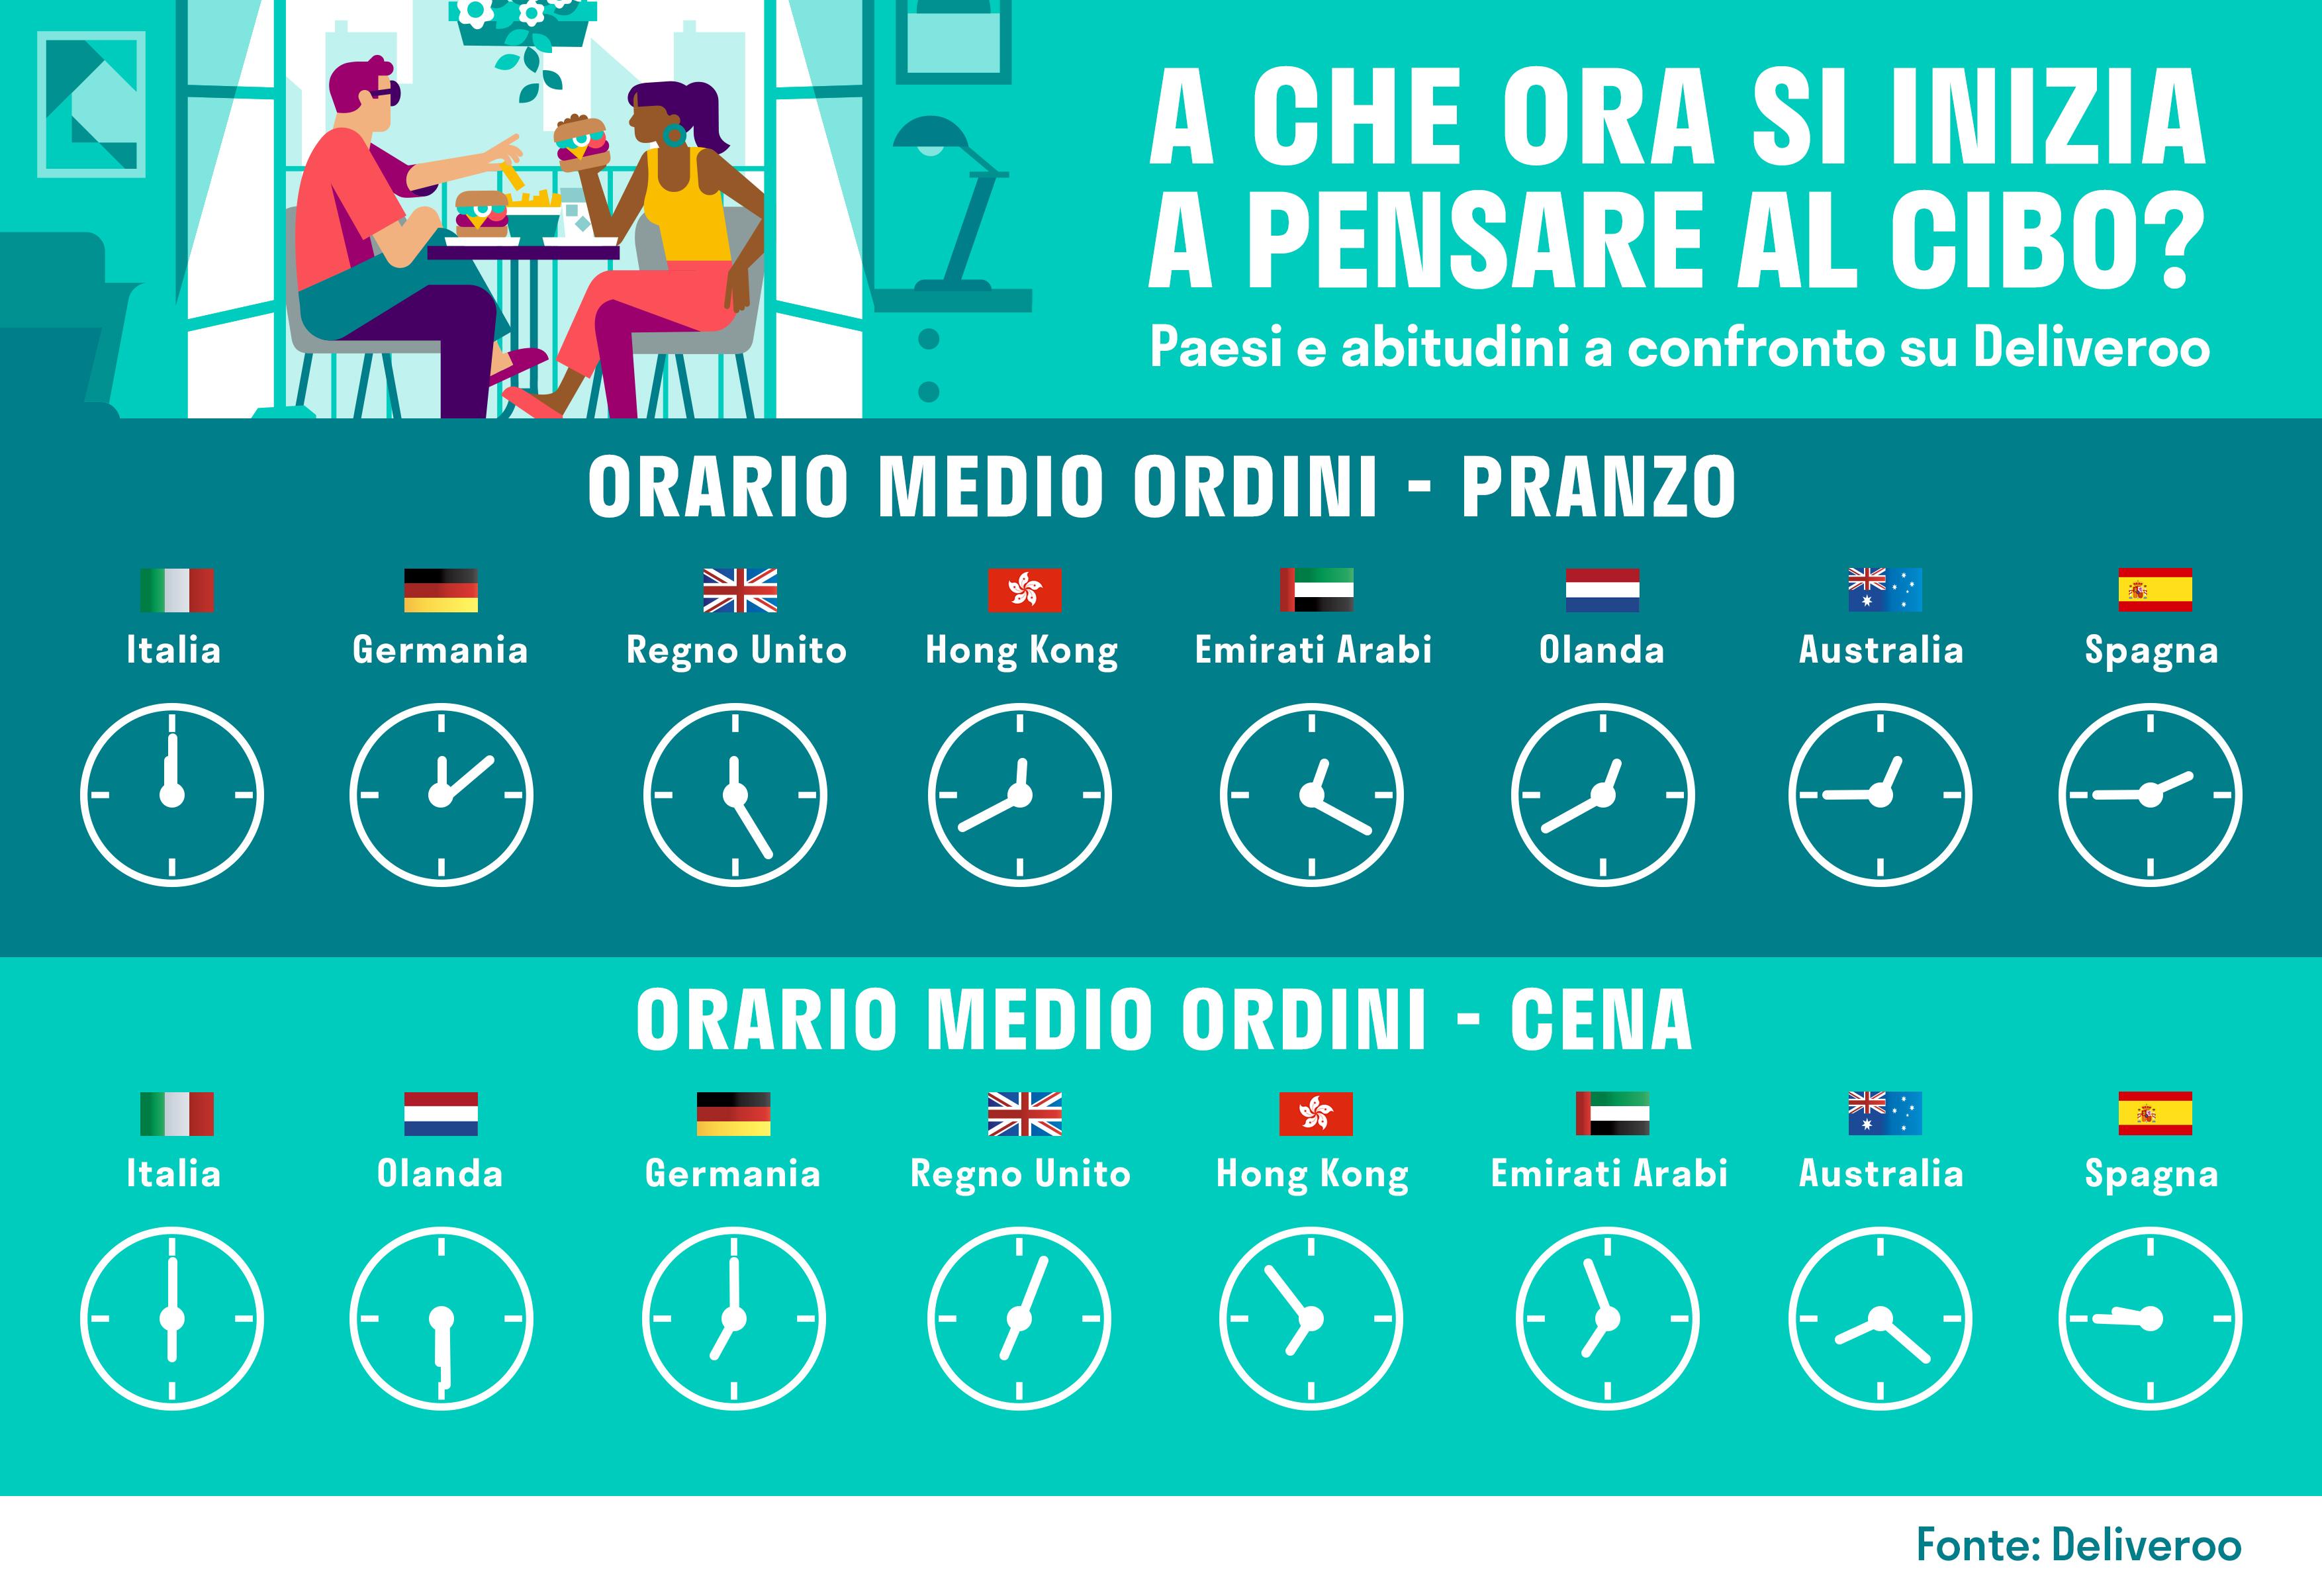 Food: Deliveroo confronta gli orari dei pasti nei diversi Paesi thumbnail